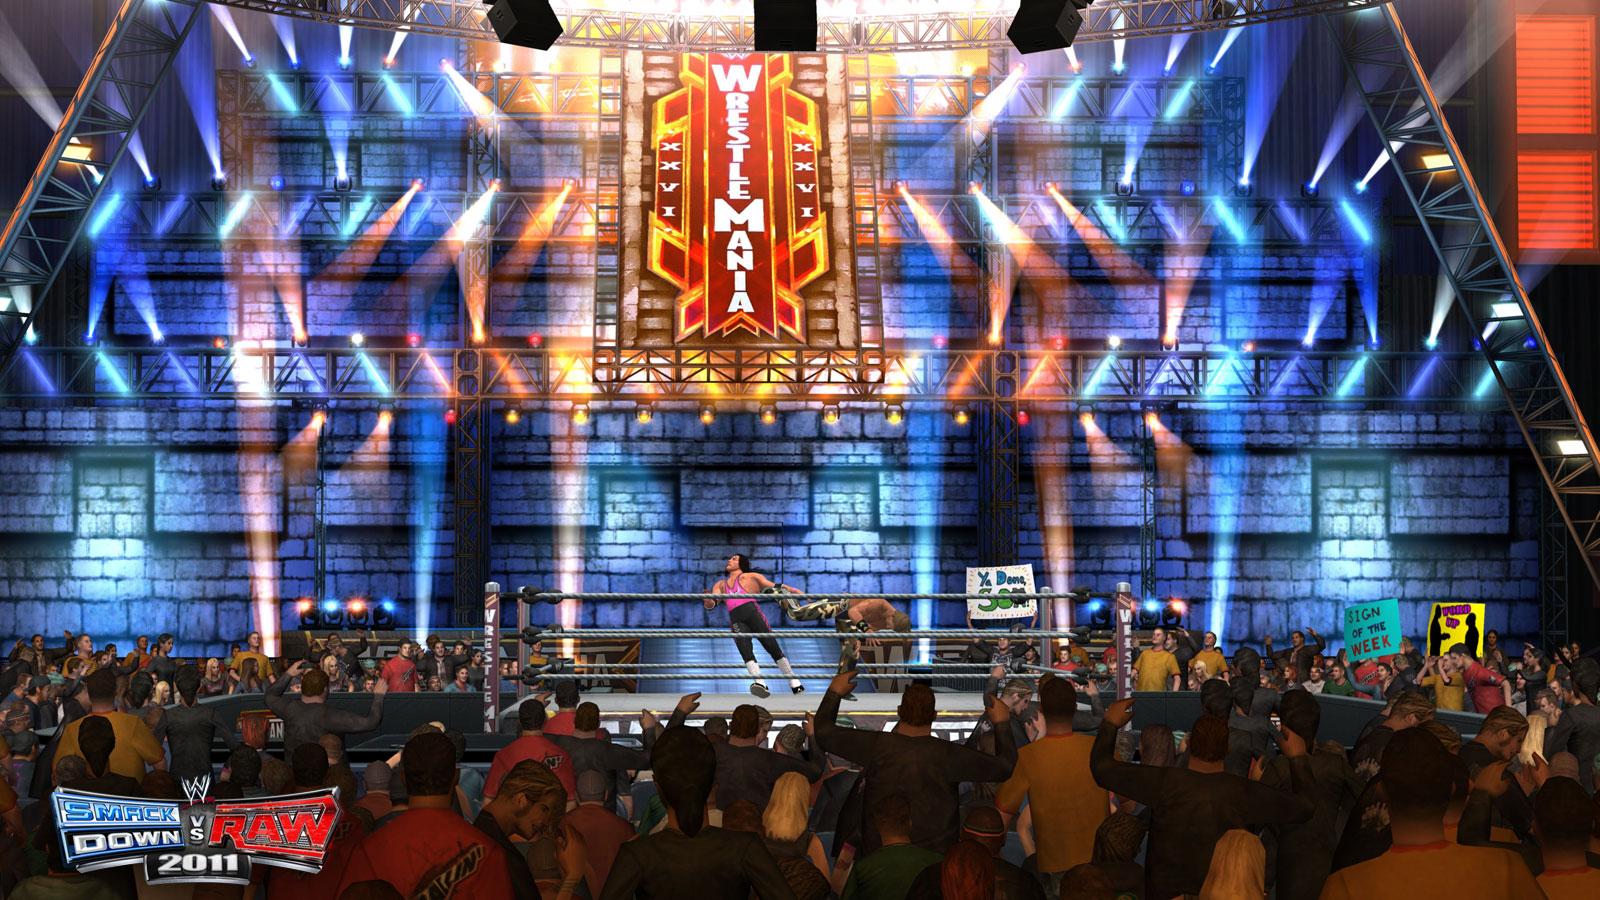 http://4.bp.blogspot.com/-vo8qZHheJSU/TbEQbqS-6LI/AAAAAAAACy4/g_kSYBnaWr0/s1600/Wrestlemania+2011+%25285%2529.jpg